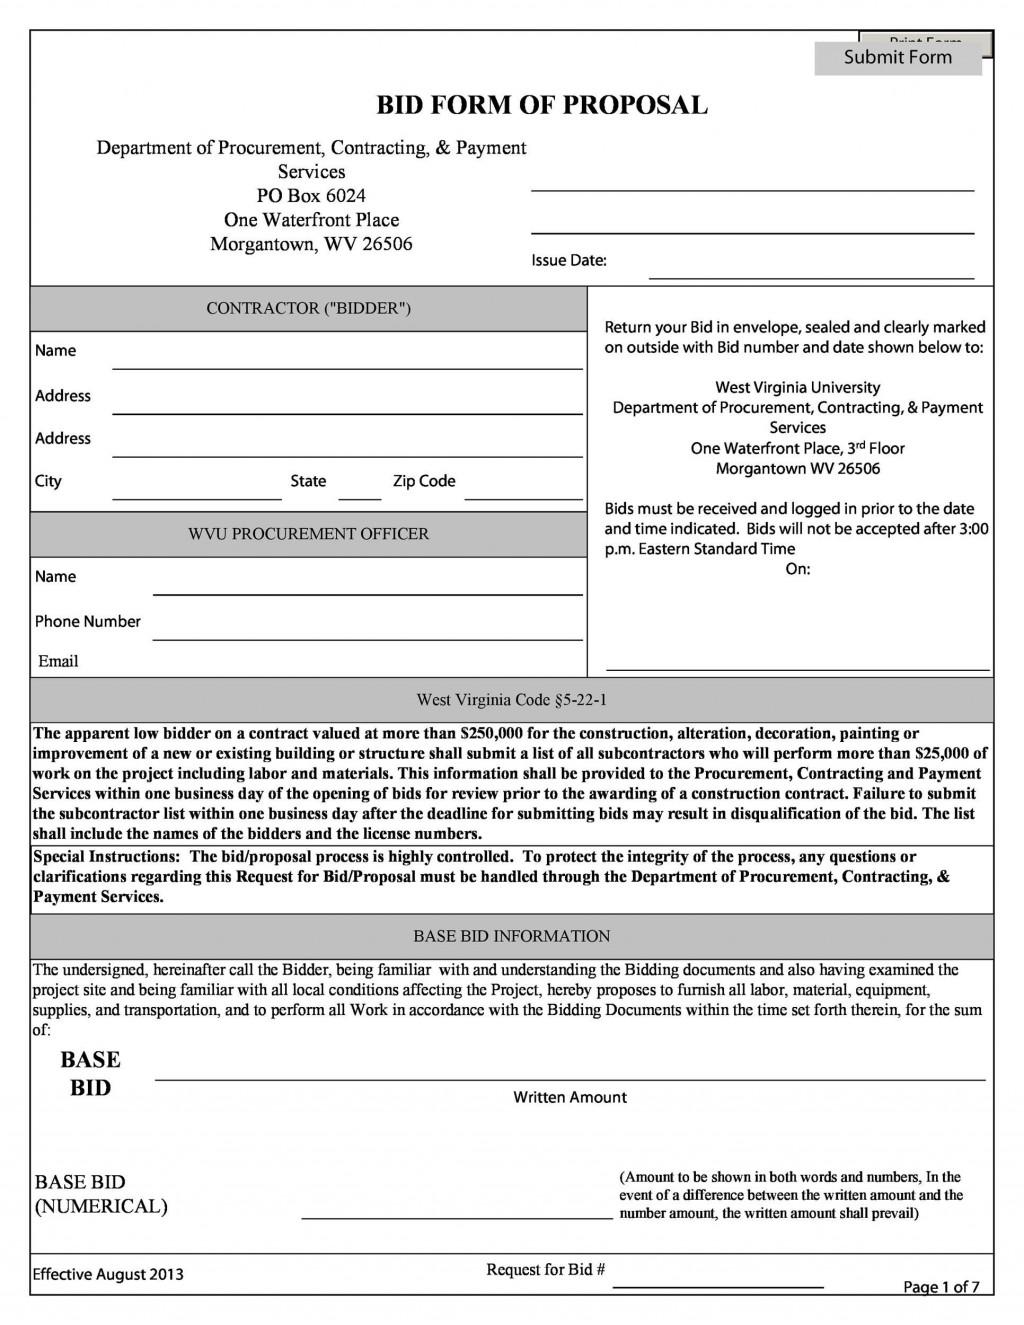 006 Best Free Bid Proposal Template Inspiration  Printable Form Word Construction DownloadLarge